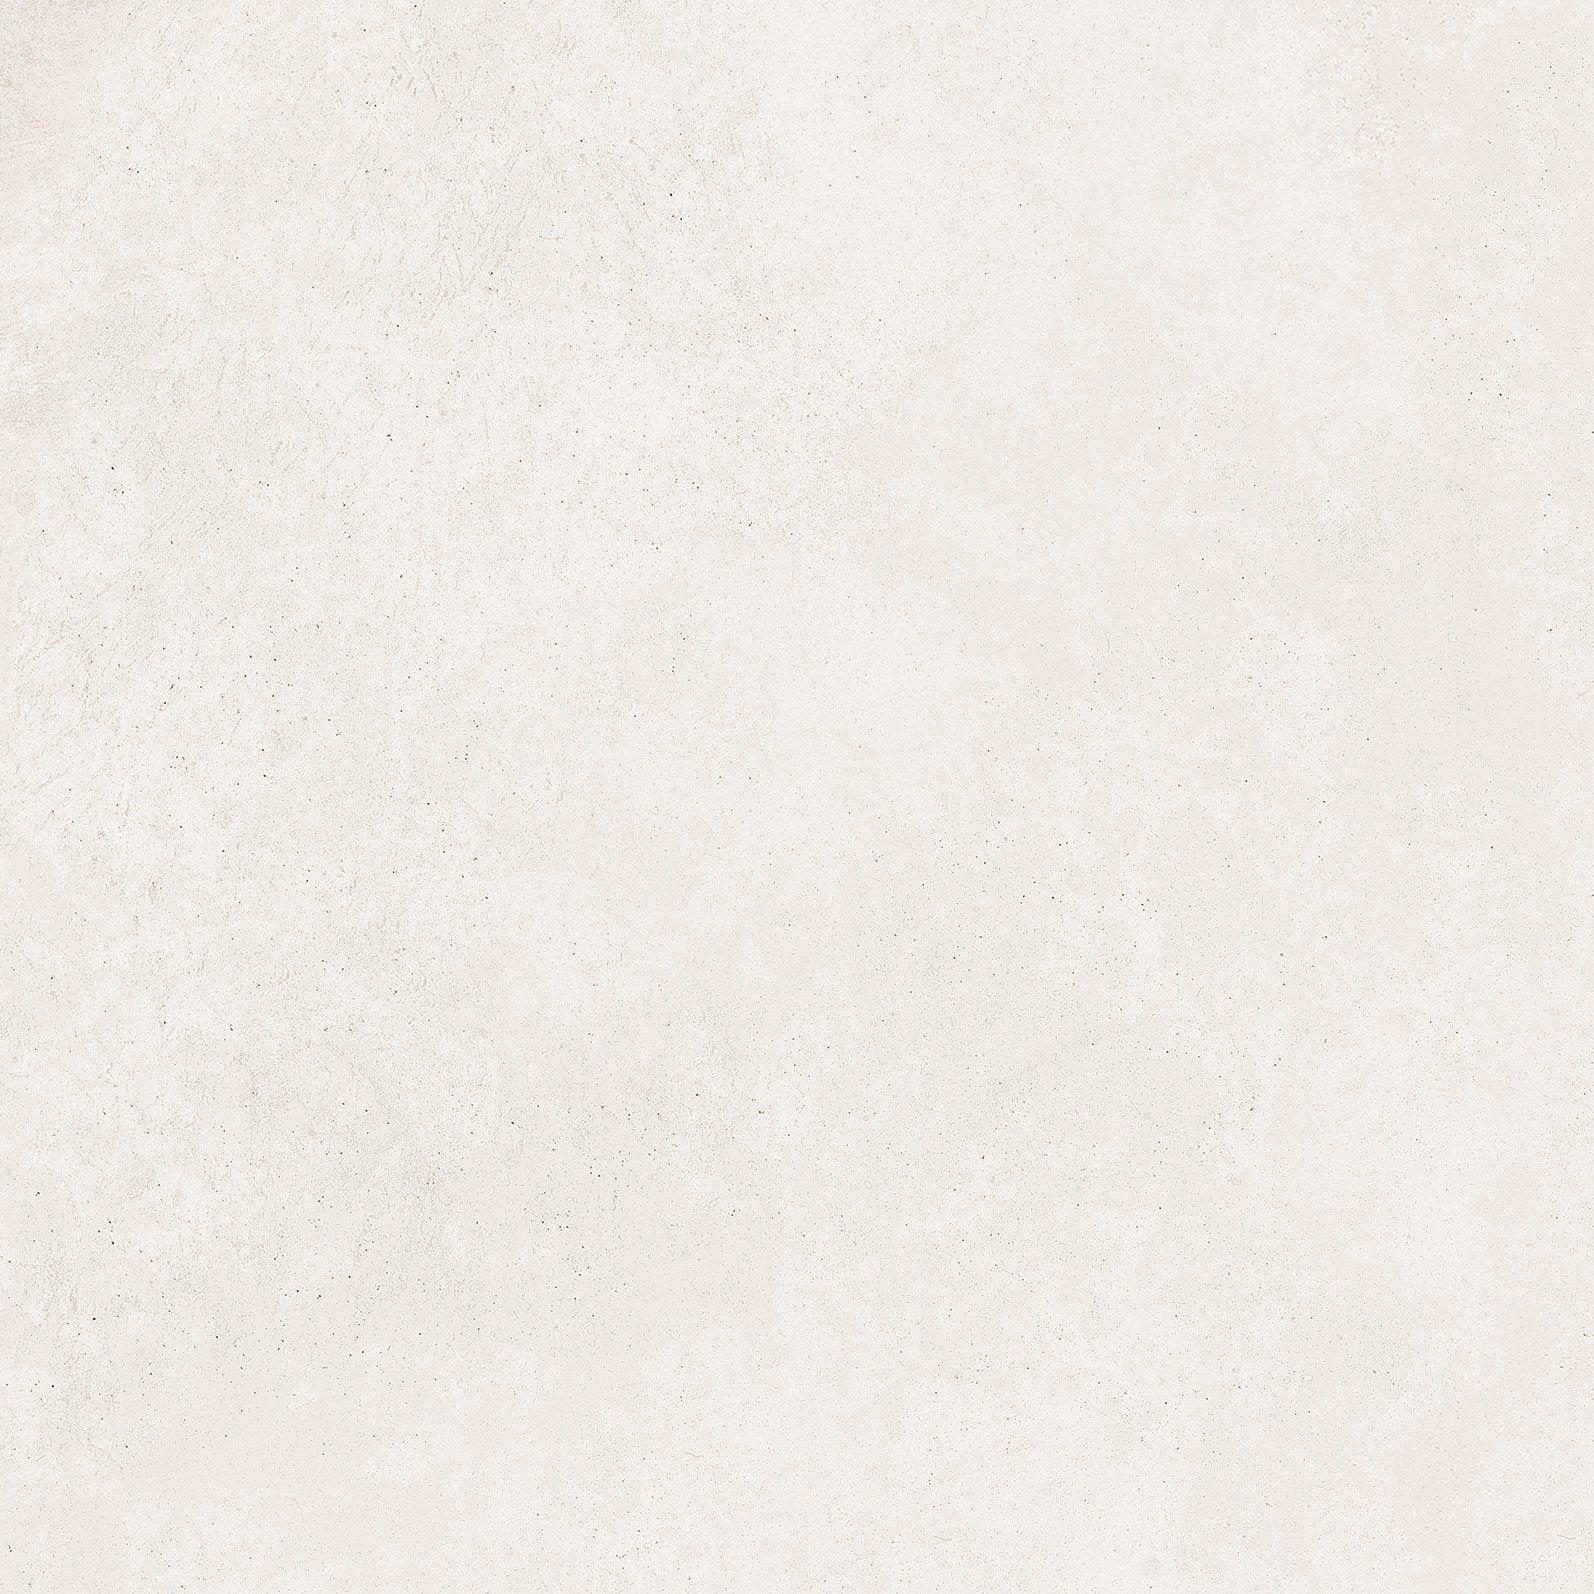 Carrelage sol et mur intenso effet béton blanc Ritual l.60 x L.60 cm SANT'AGOSTI